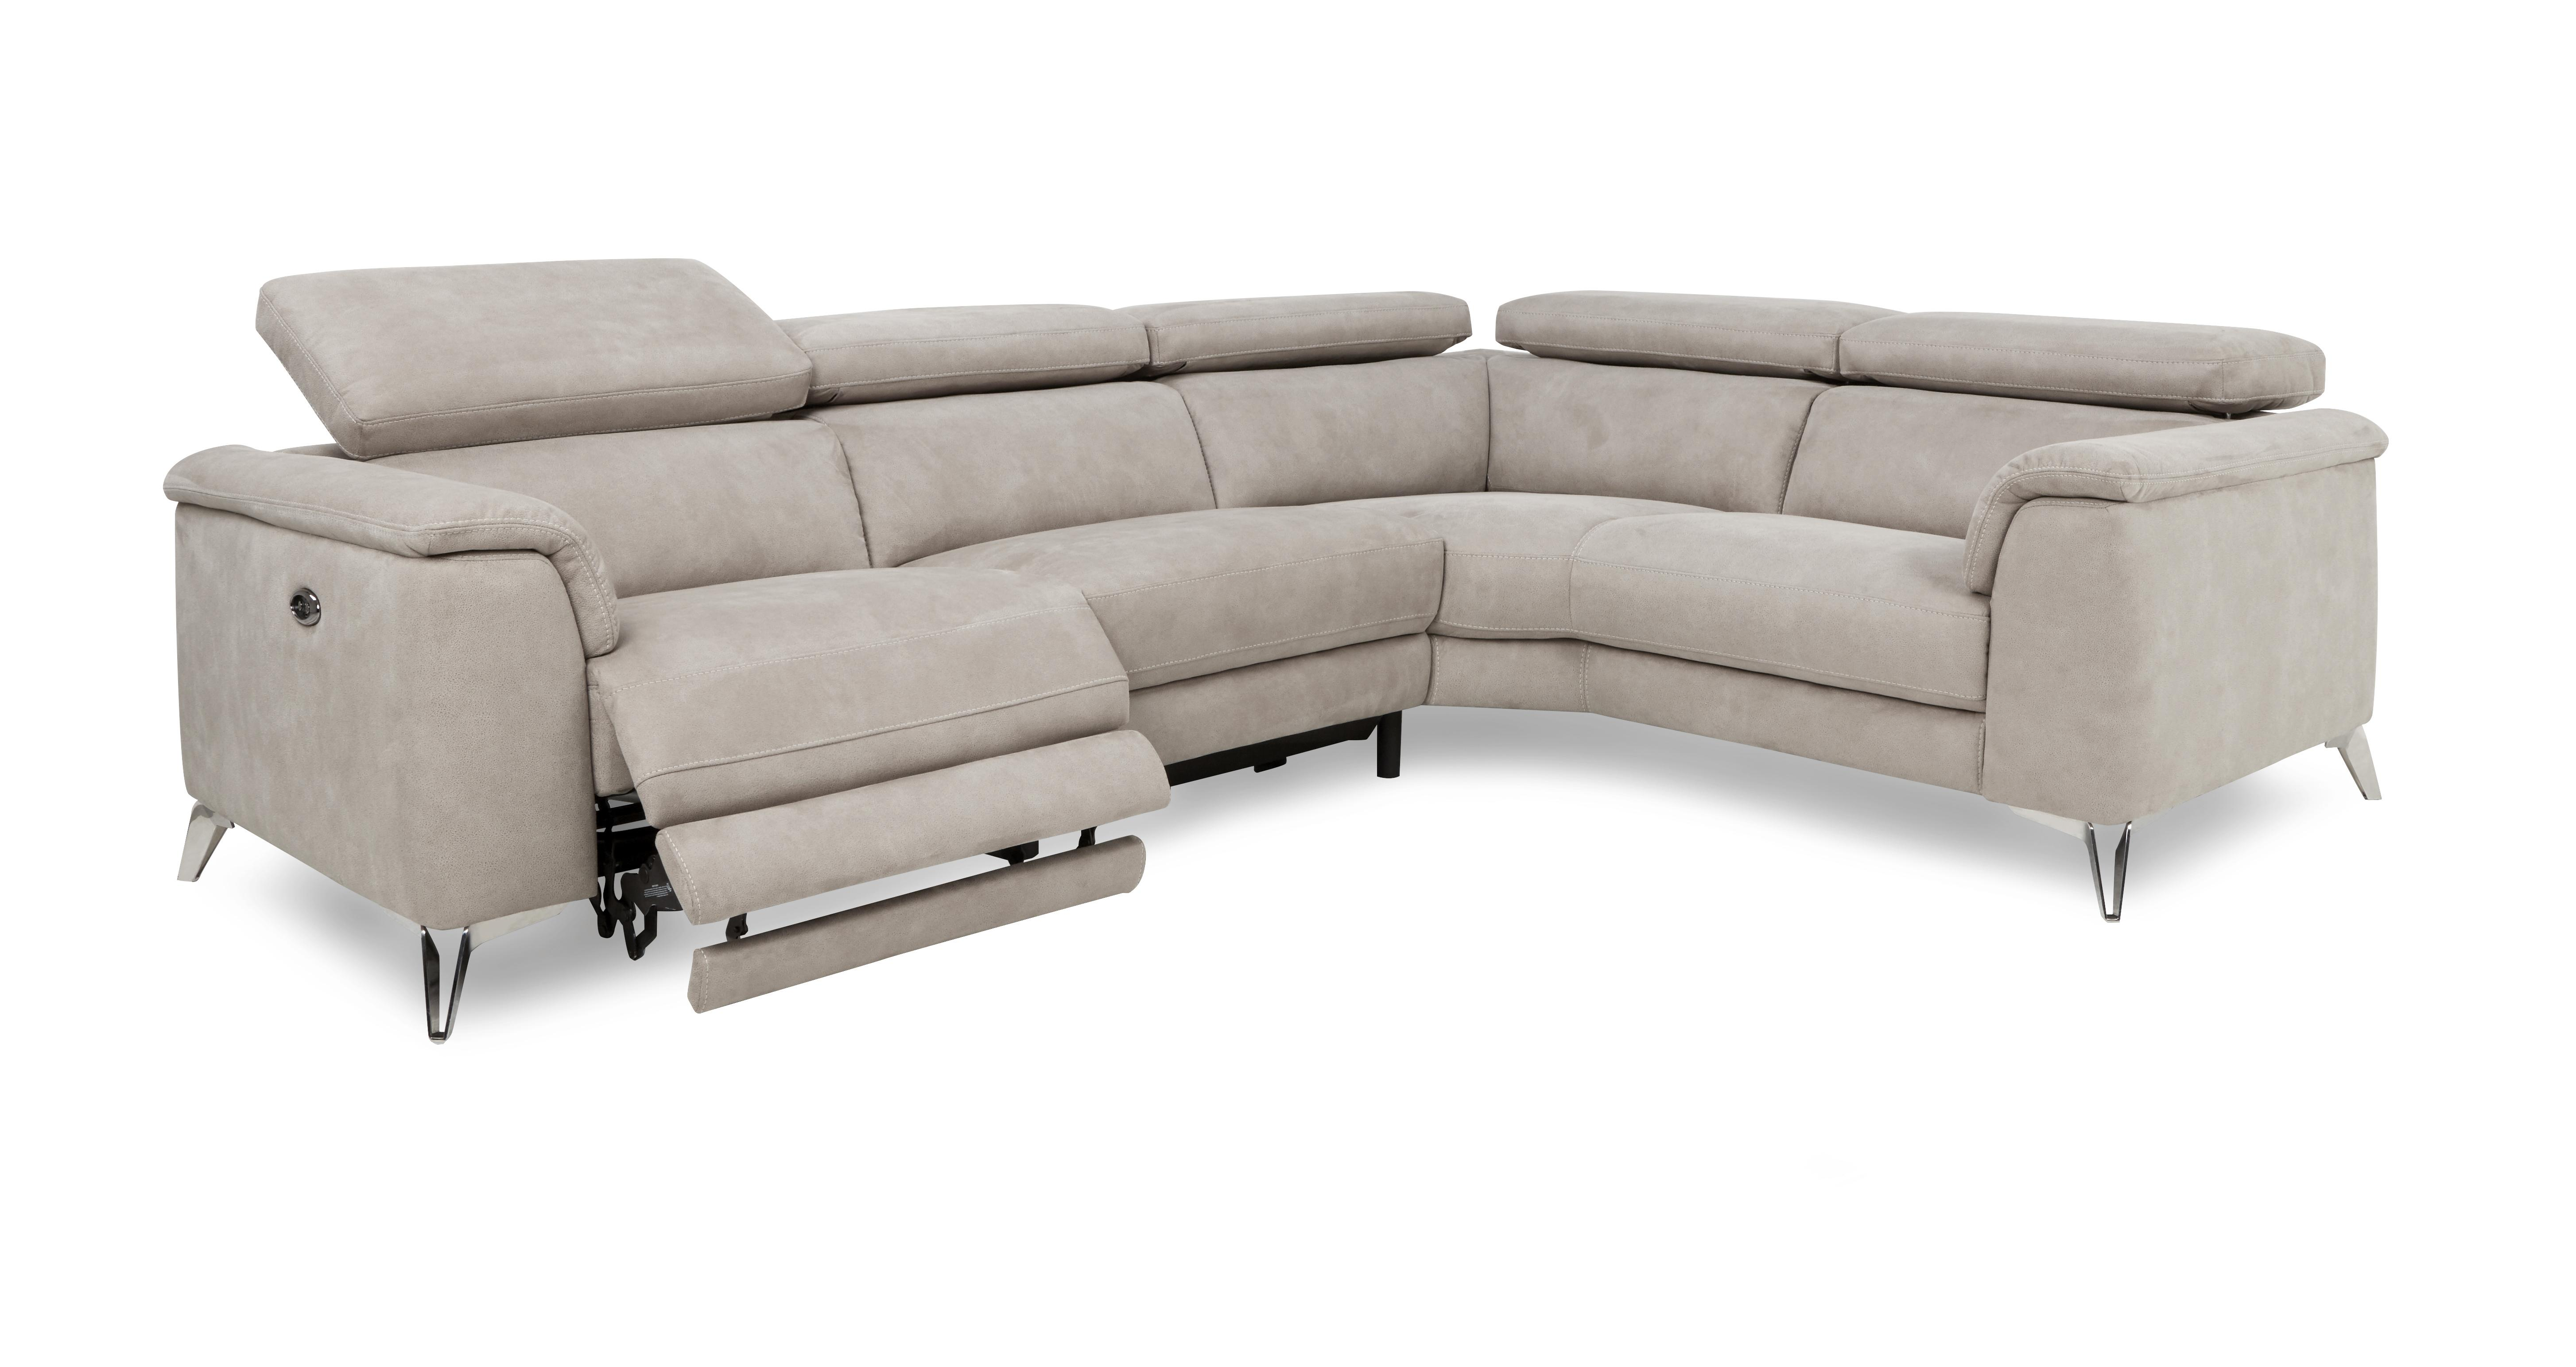 corner sofa bed recliner hanging chair tahiti option c left hand facing 2 seat piece power group